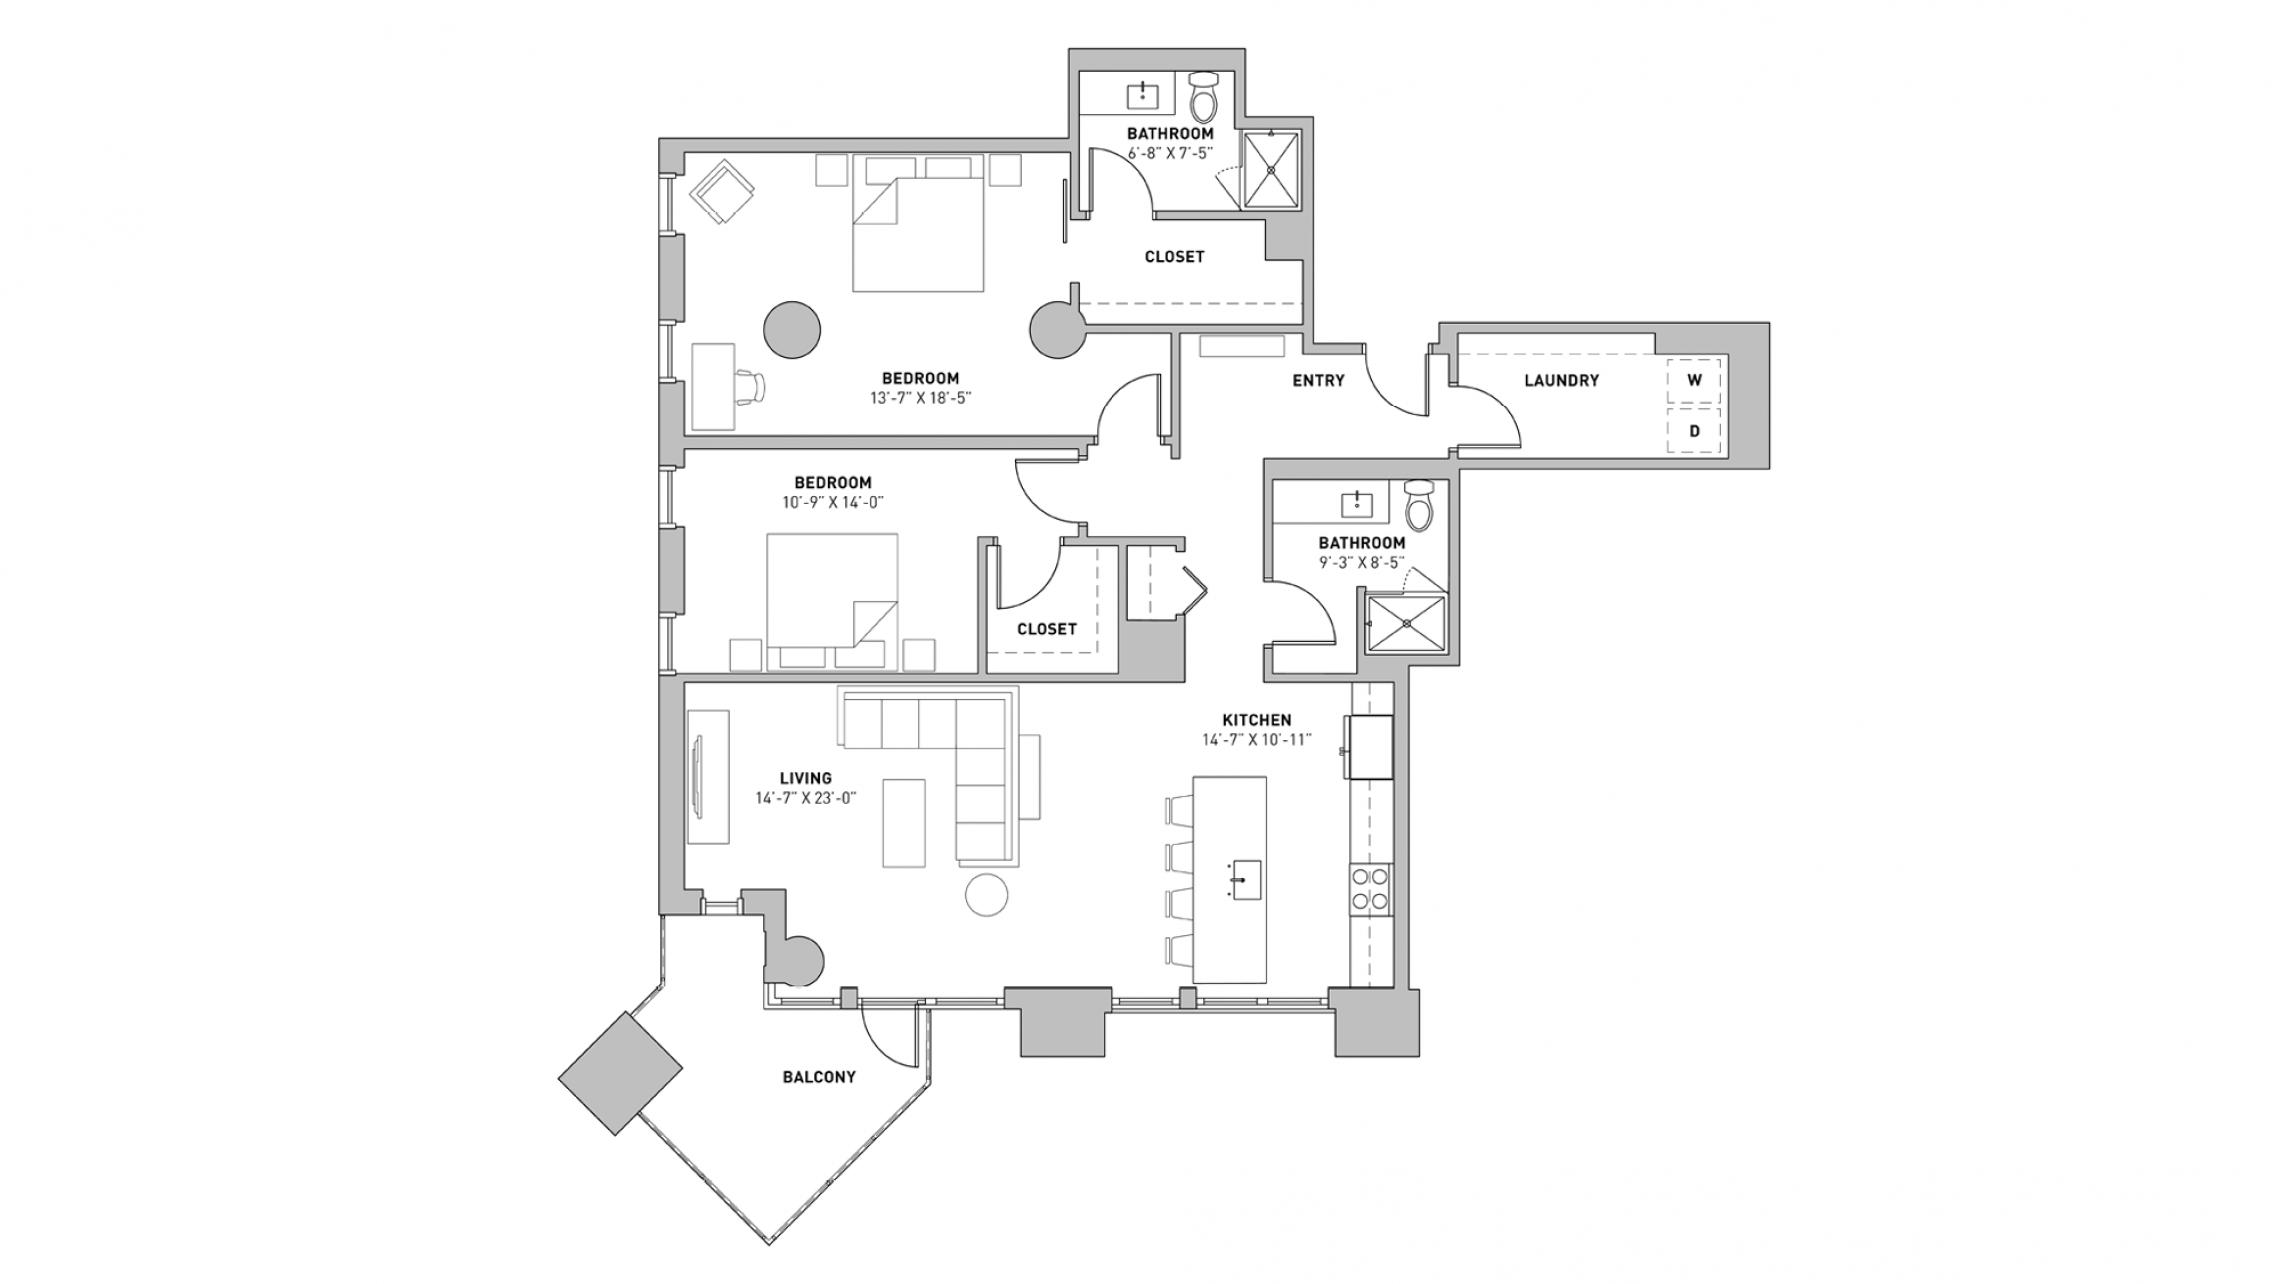 ULI The Pressman 302 - Two Bedroom, Two Bathroom